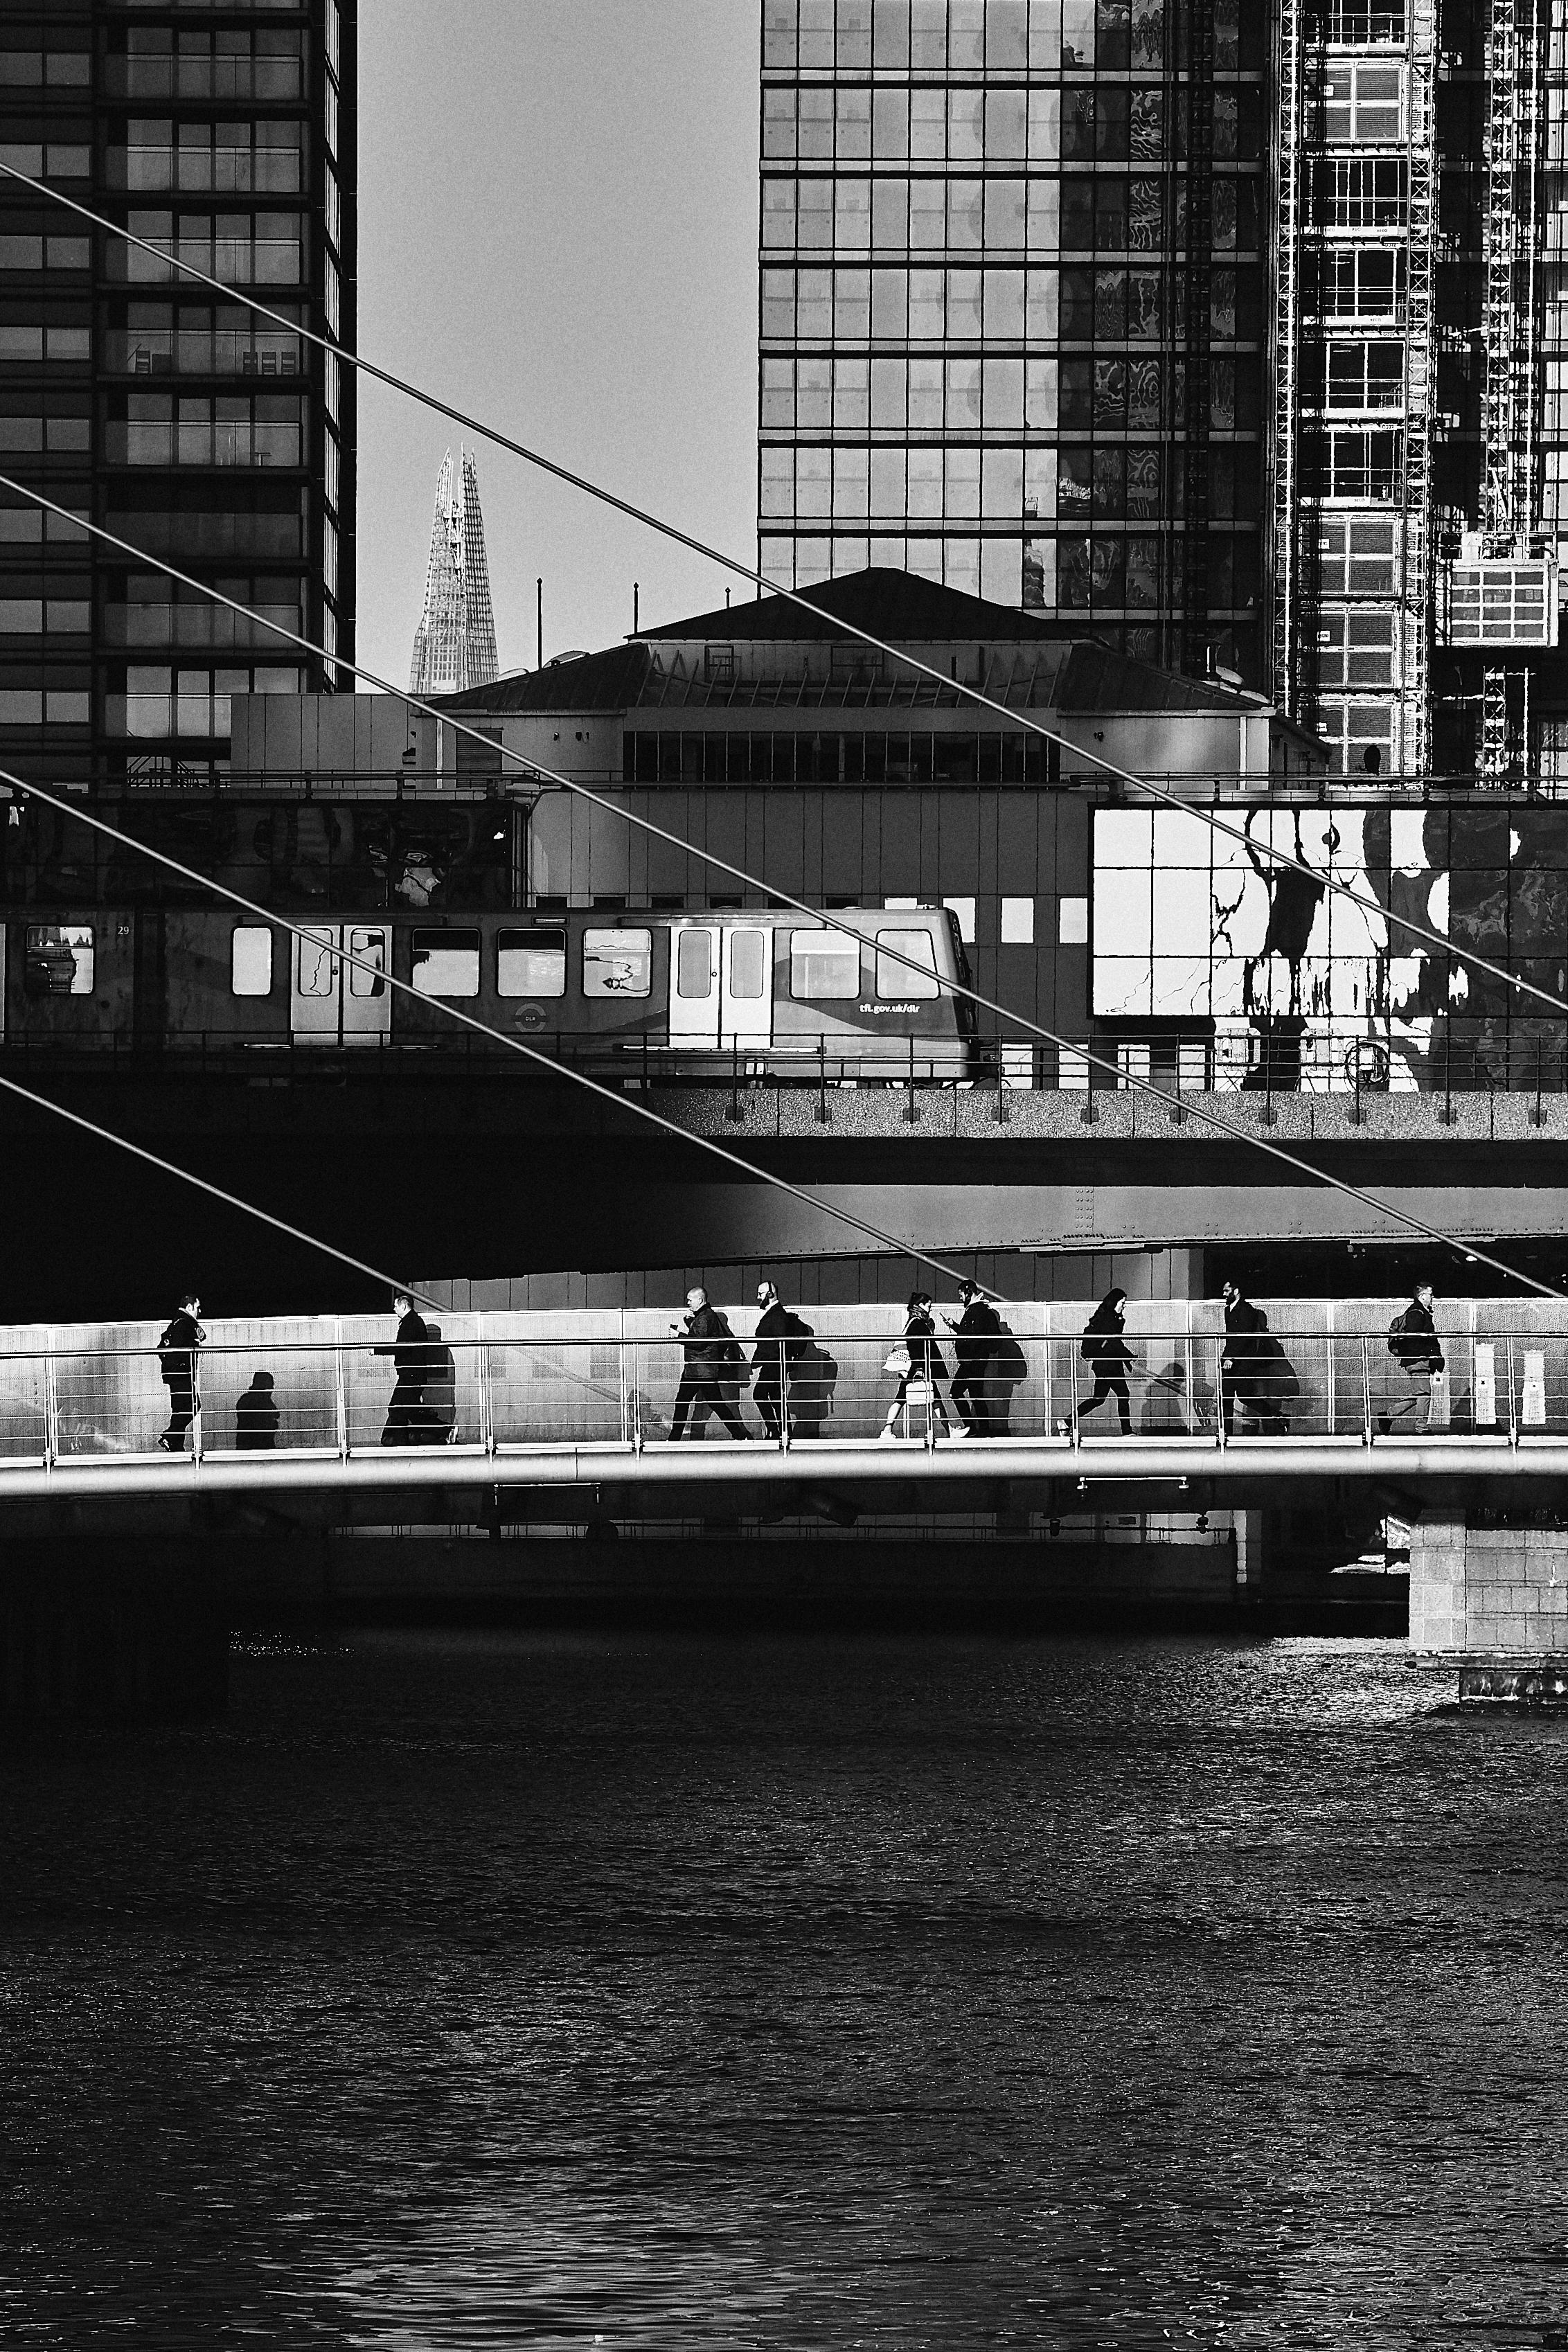 London_City_Commuters_25_03_19_0298.jpg